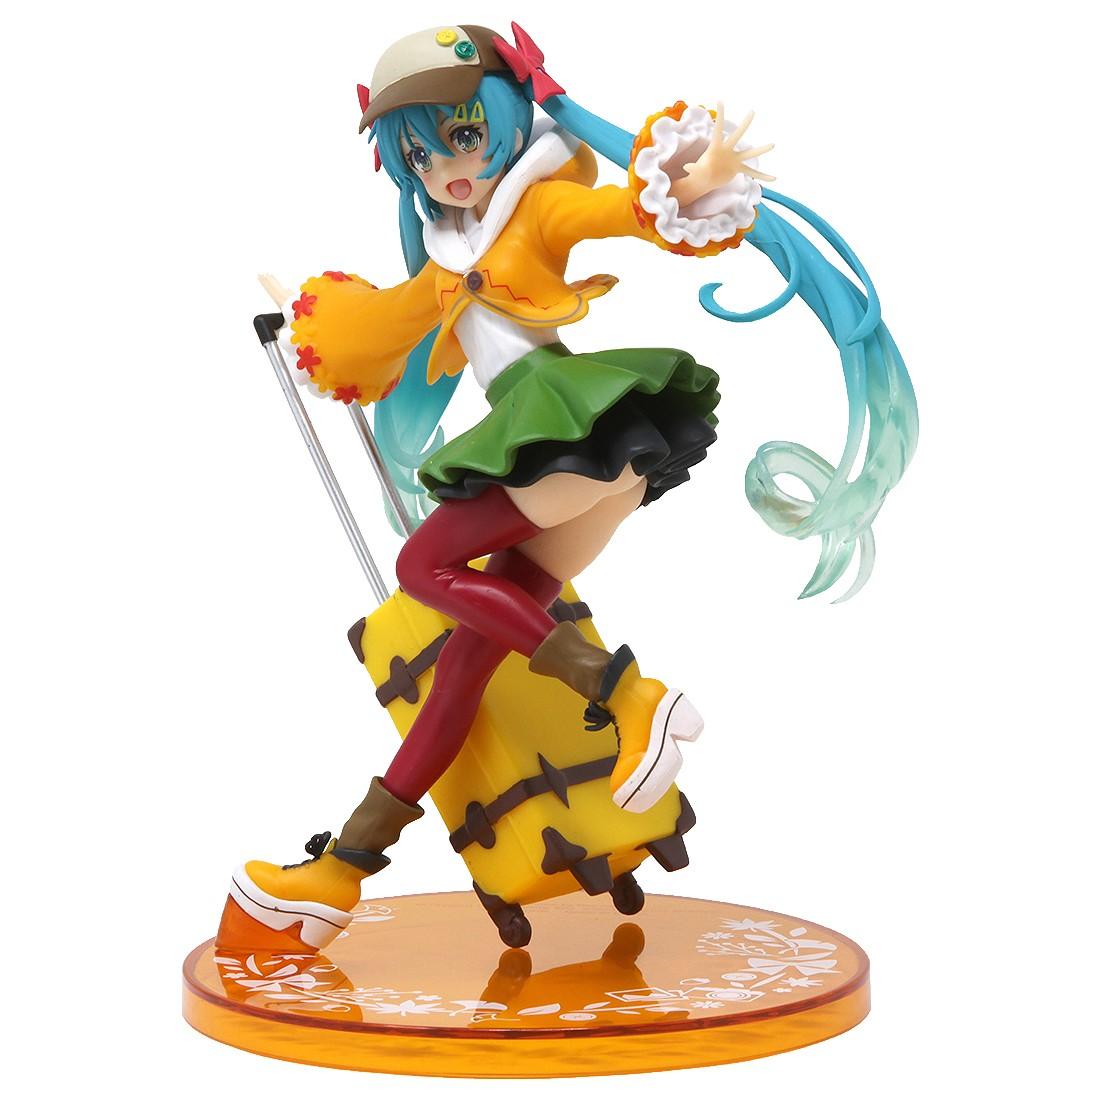 Taito Hatsune Miku Autumn Ver. Renewal Figure (yellow)